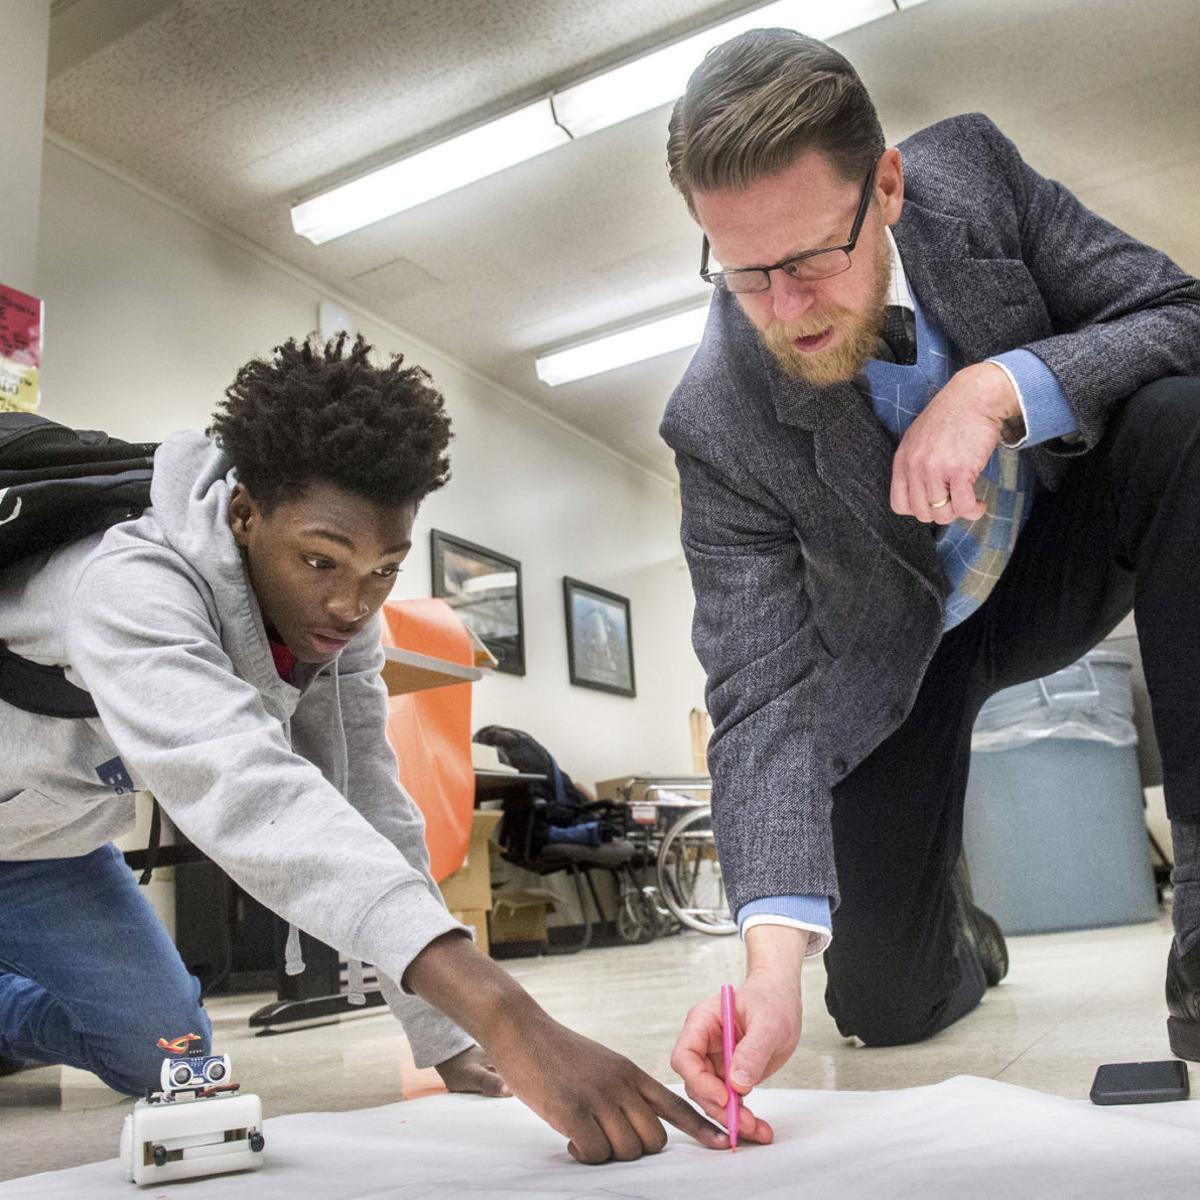 FUSE Studio inspires STEM learning at Peoria school   State